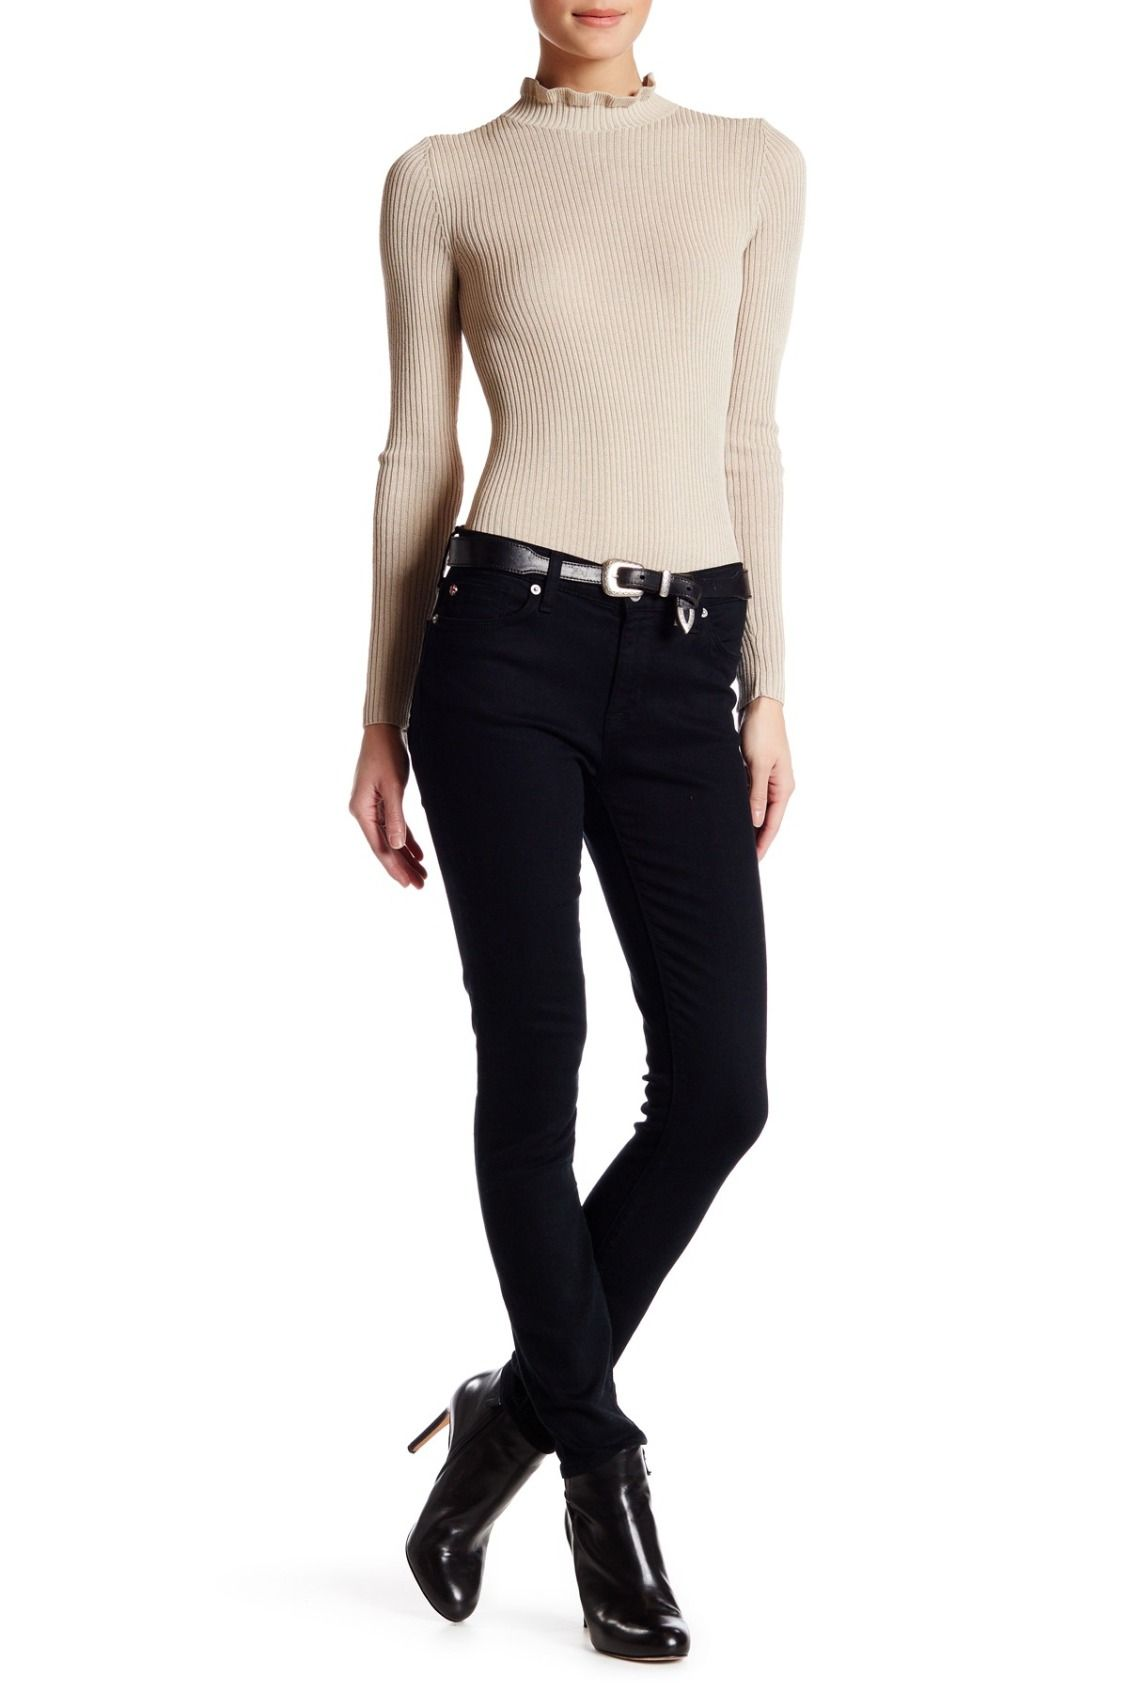 Classic black skinnies!  HUDSON Jeans Nico Mid Rise Super Skinny Ankle Jean